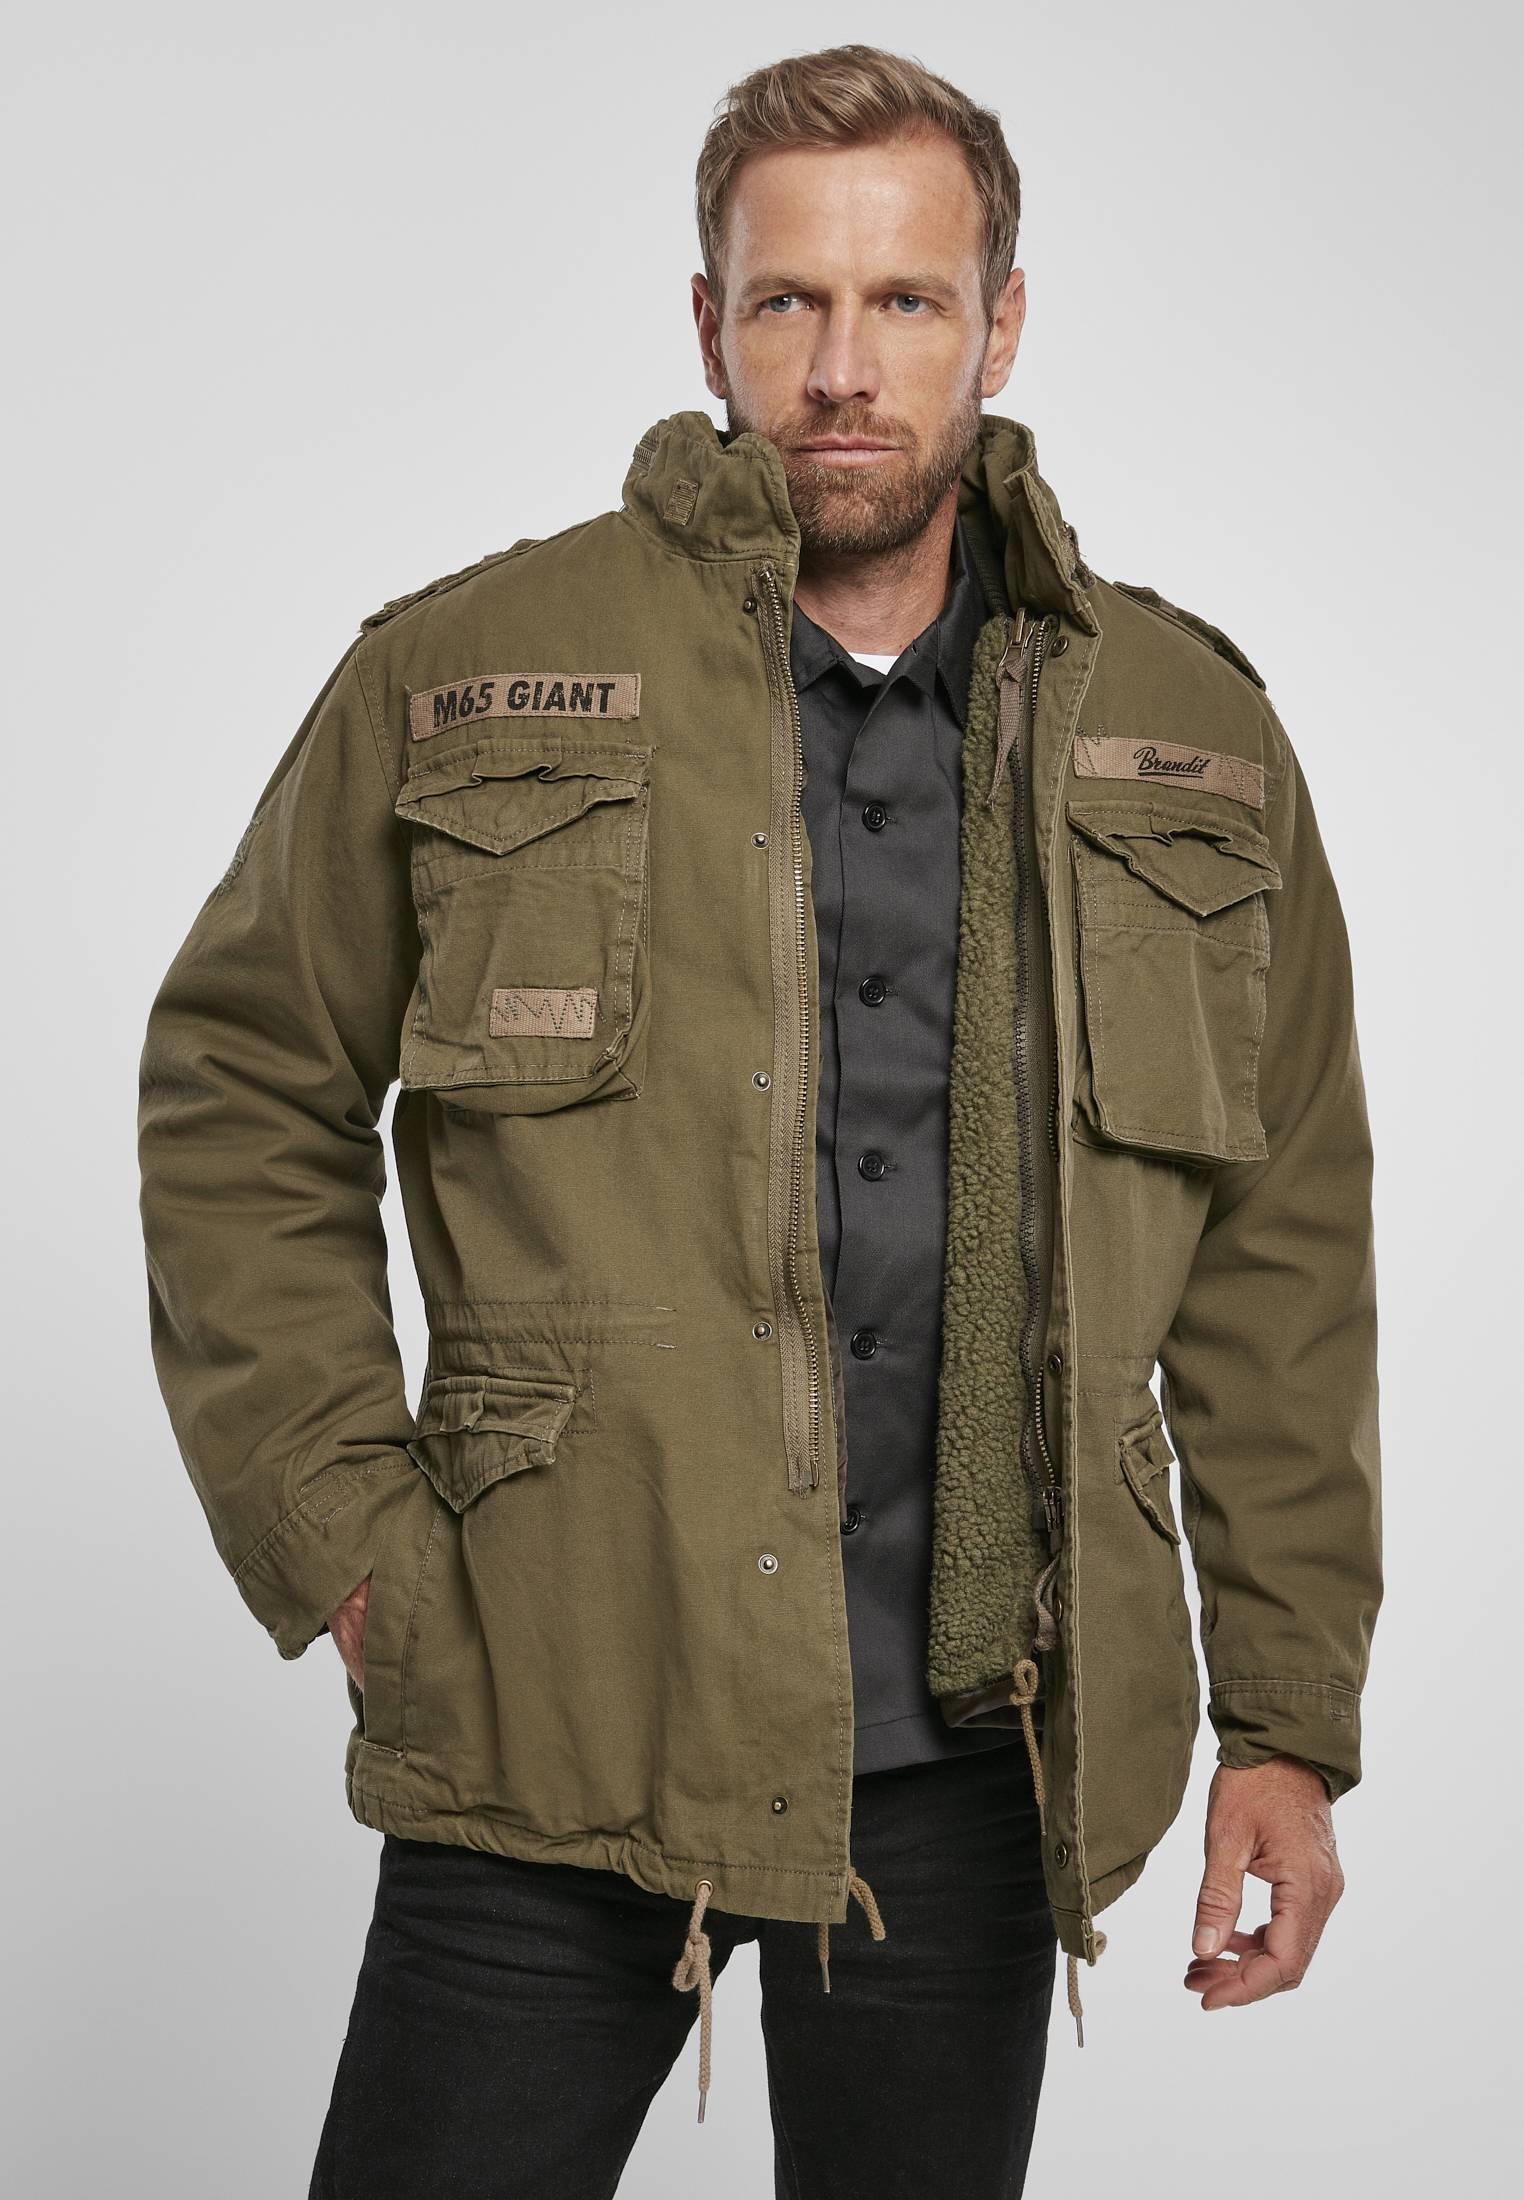 Urban Classics Brandit M-65 Giant Jacket olive - S